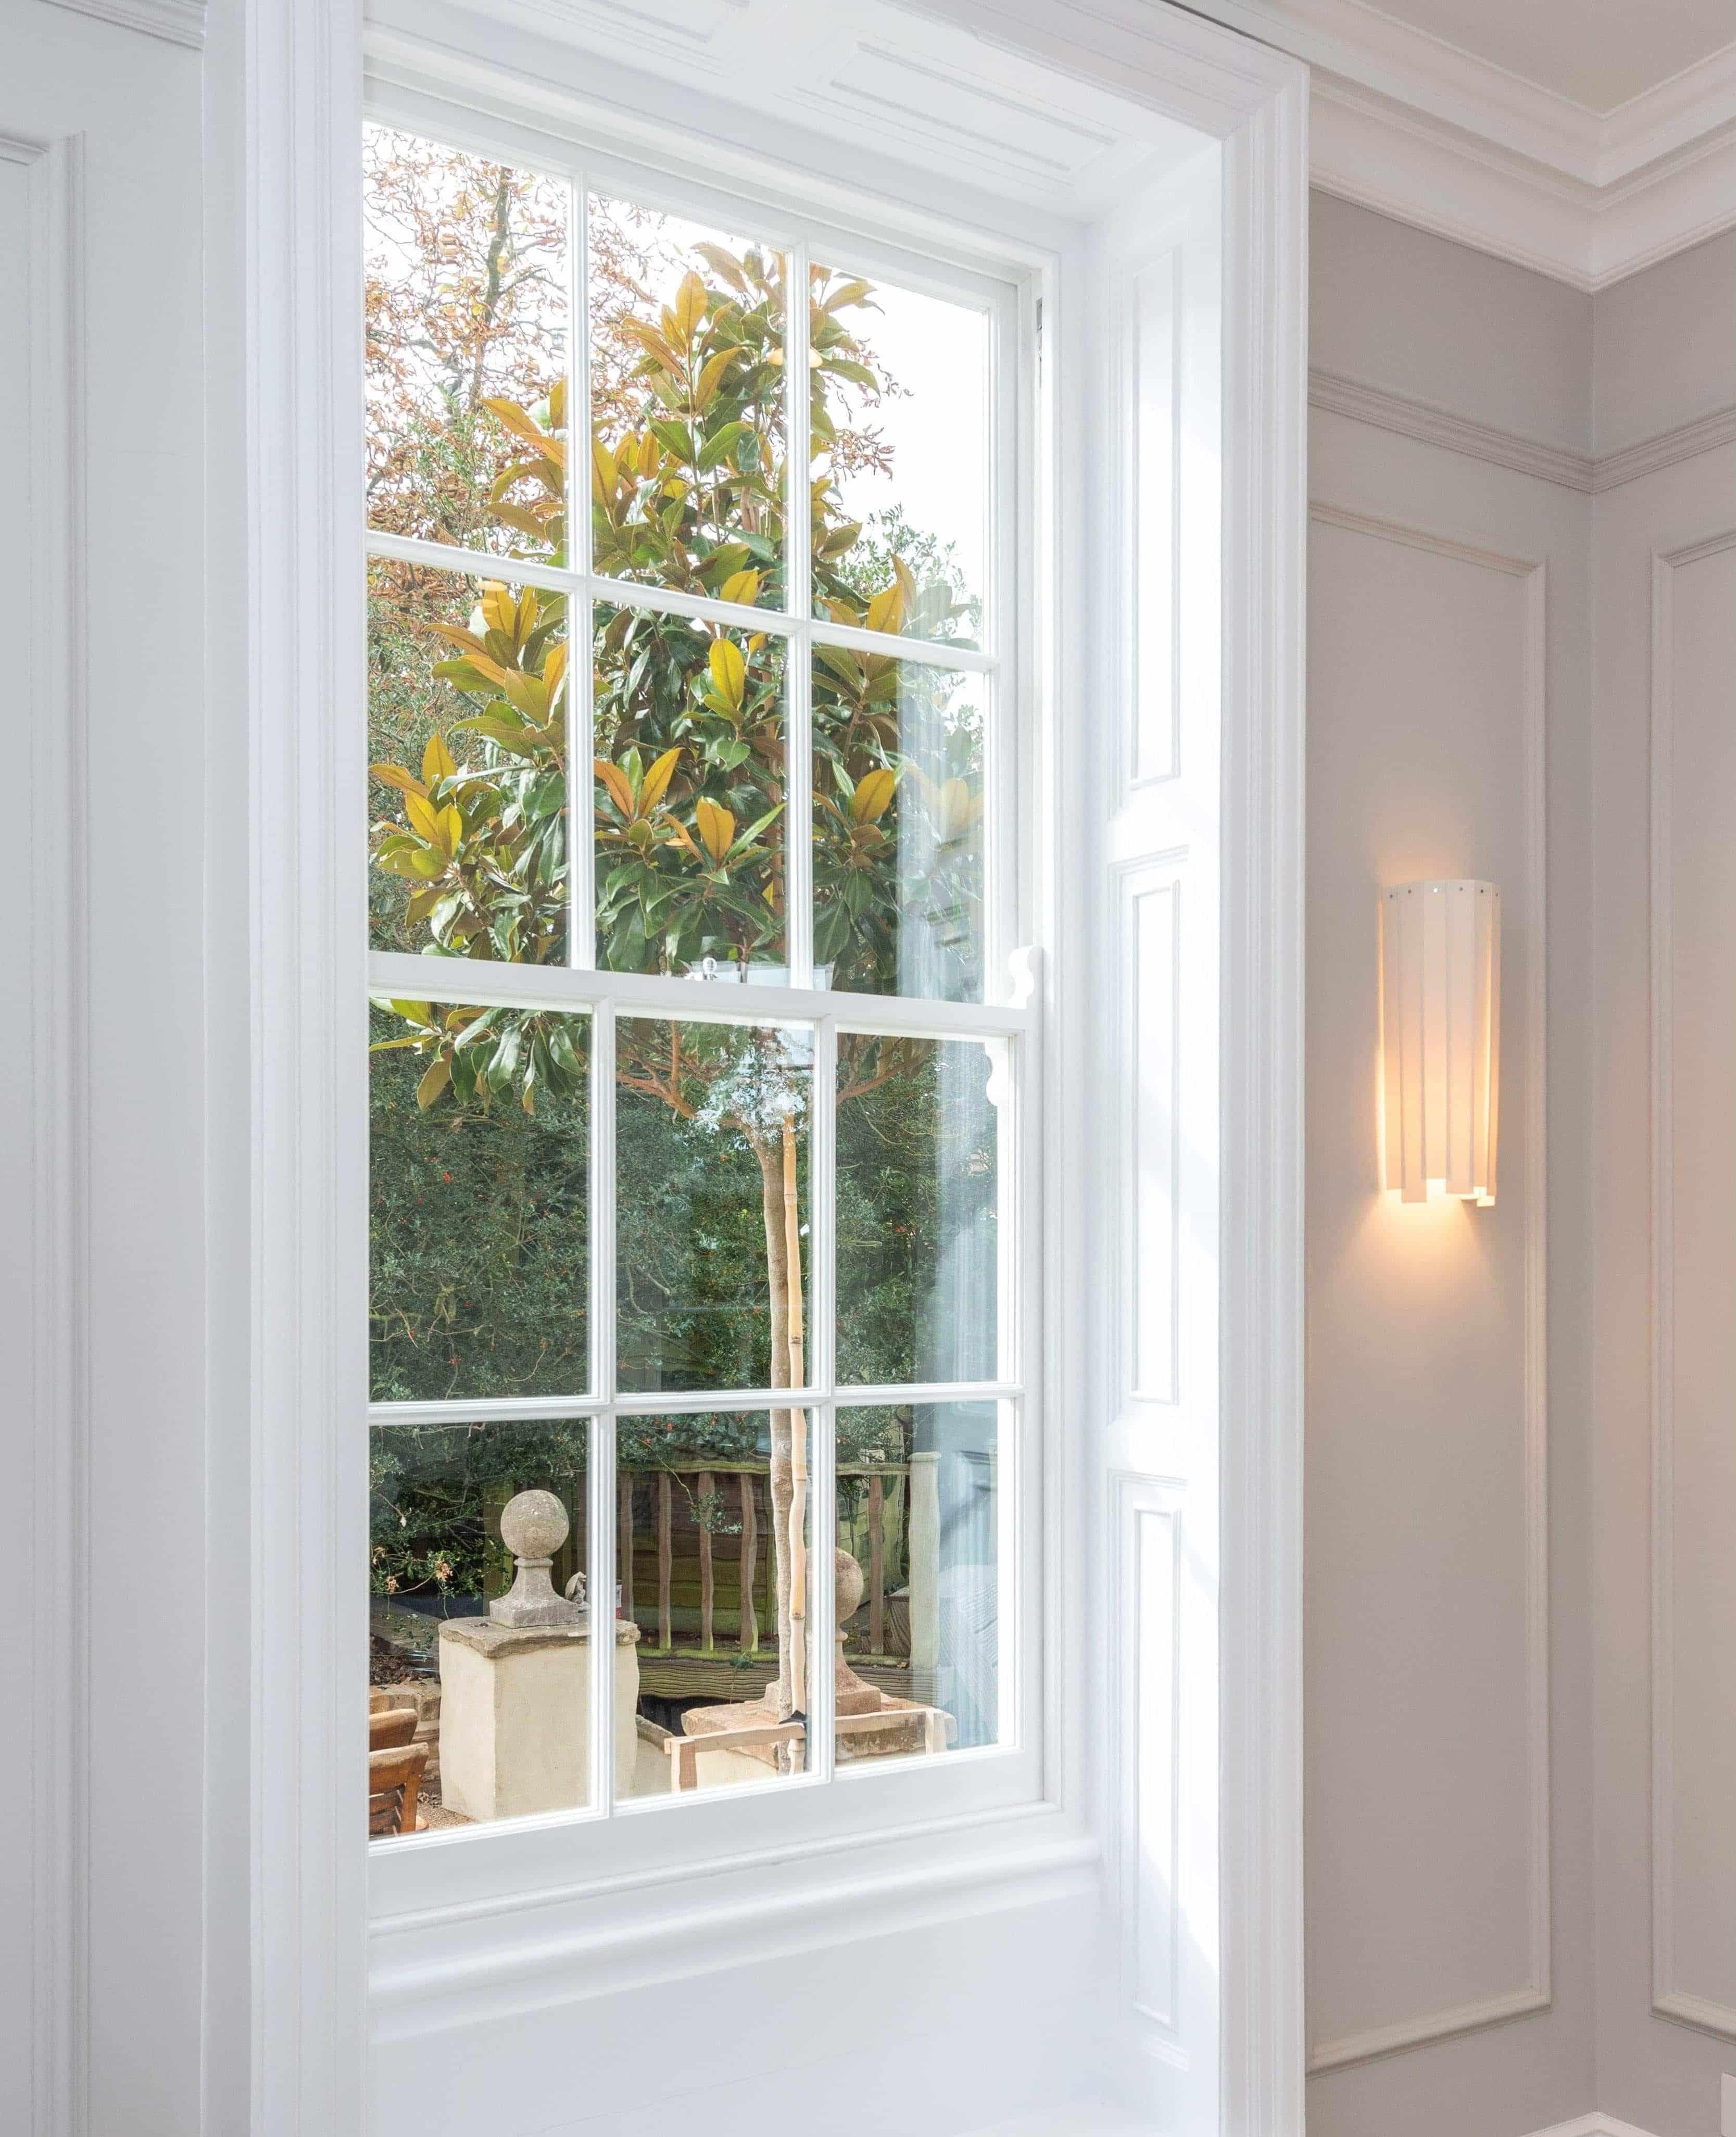 Traditional Georgian sash windows